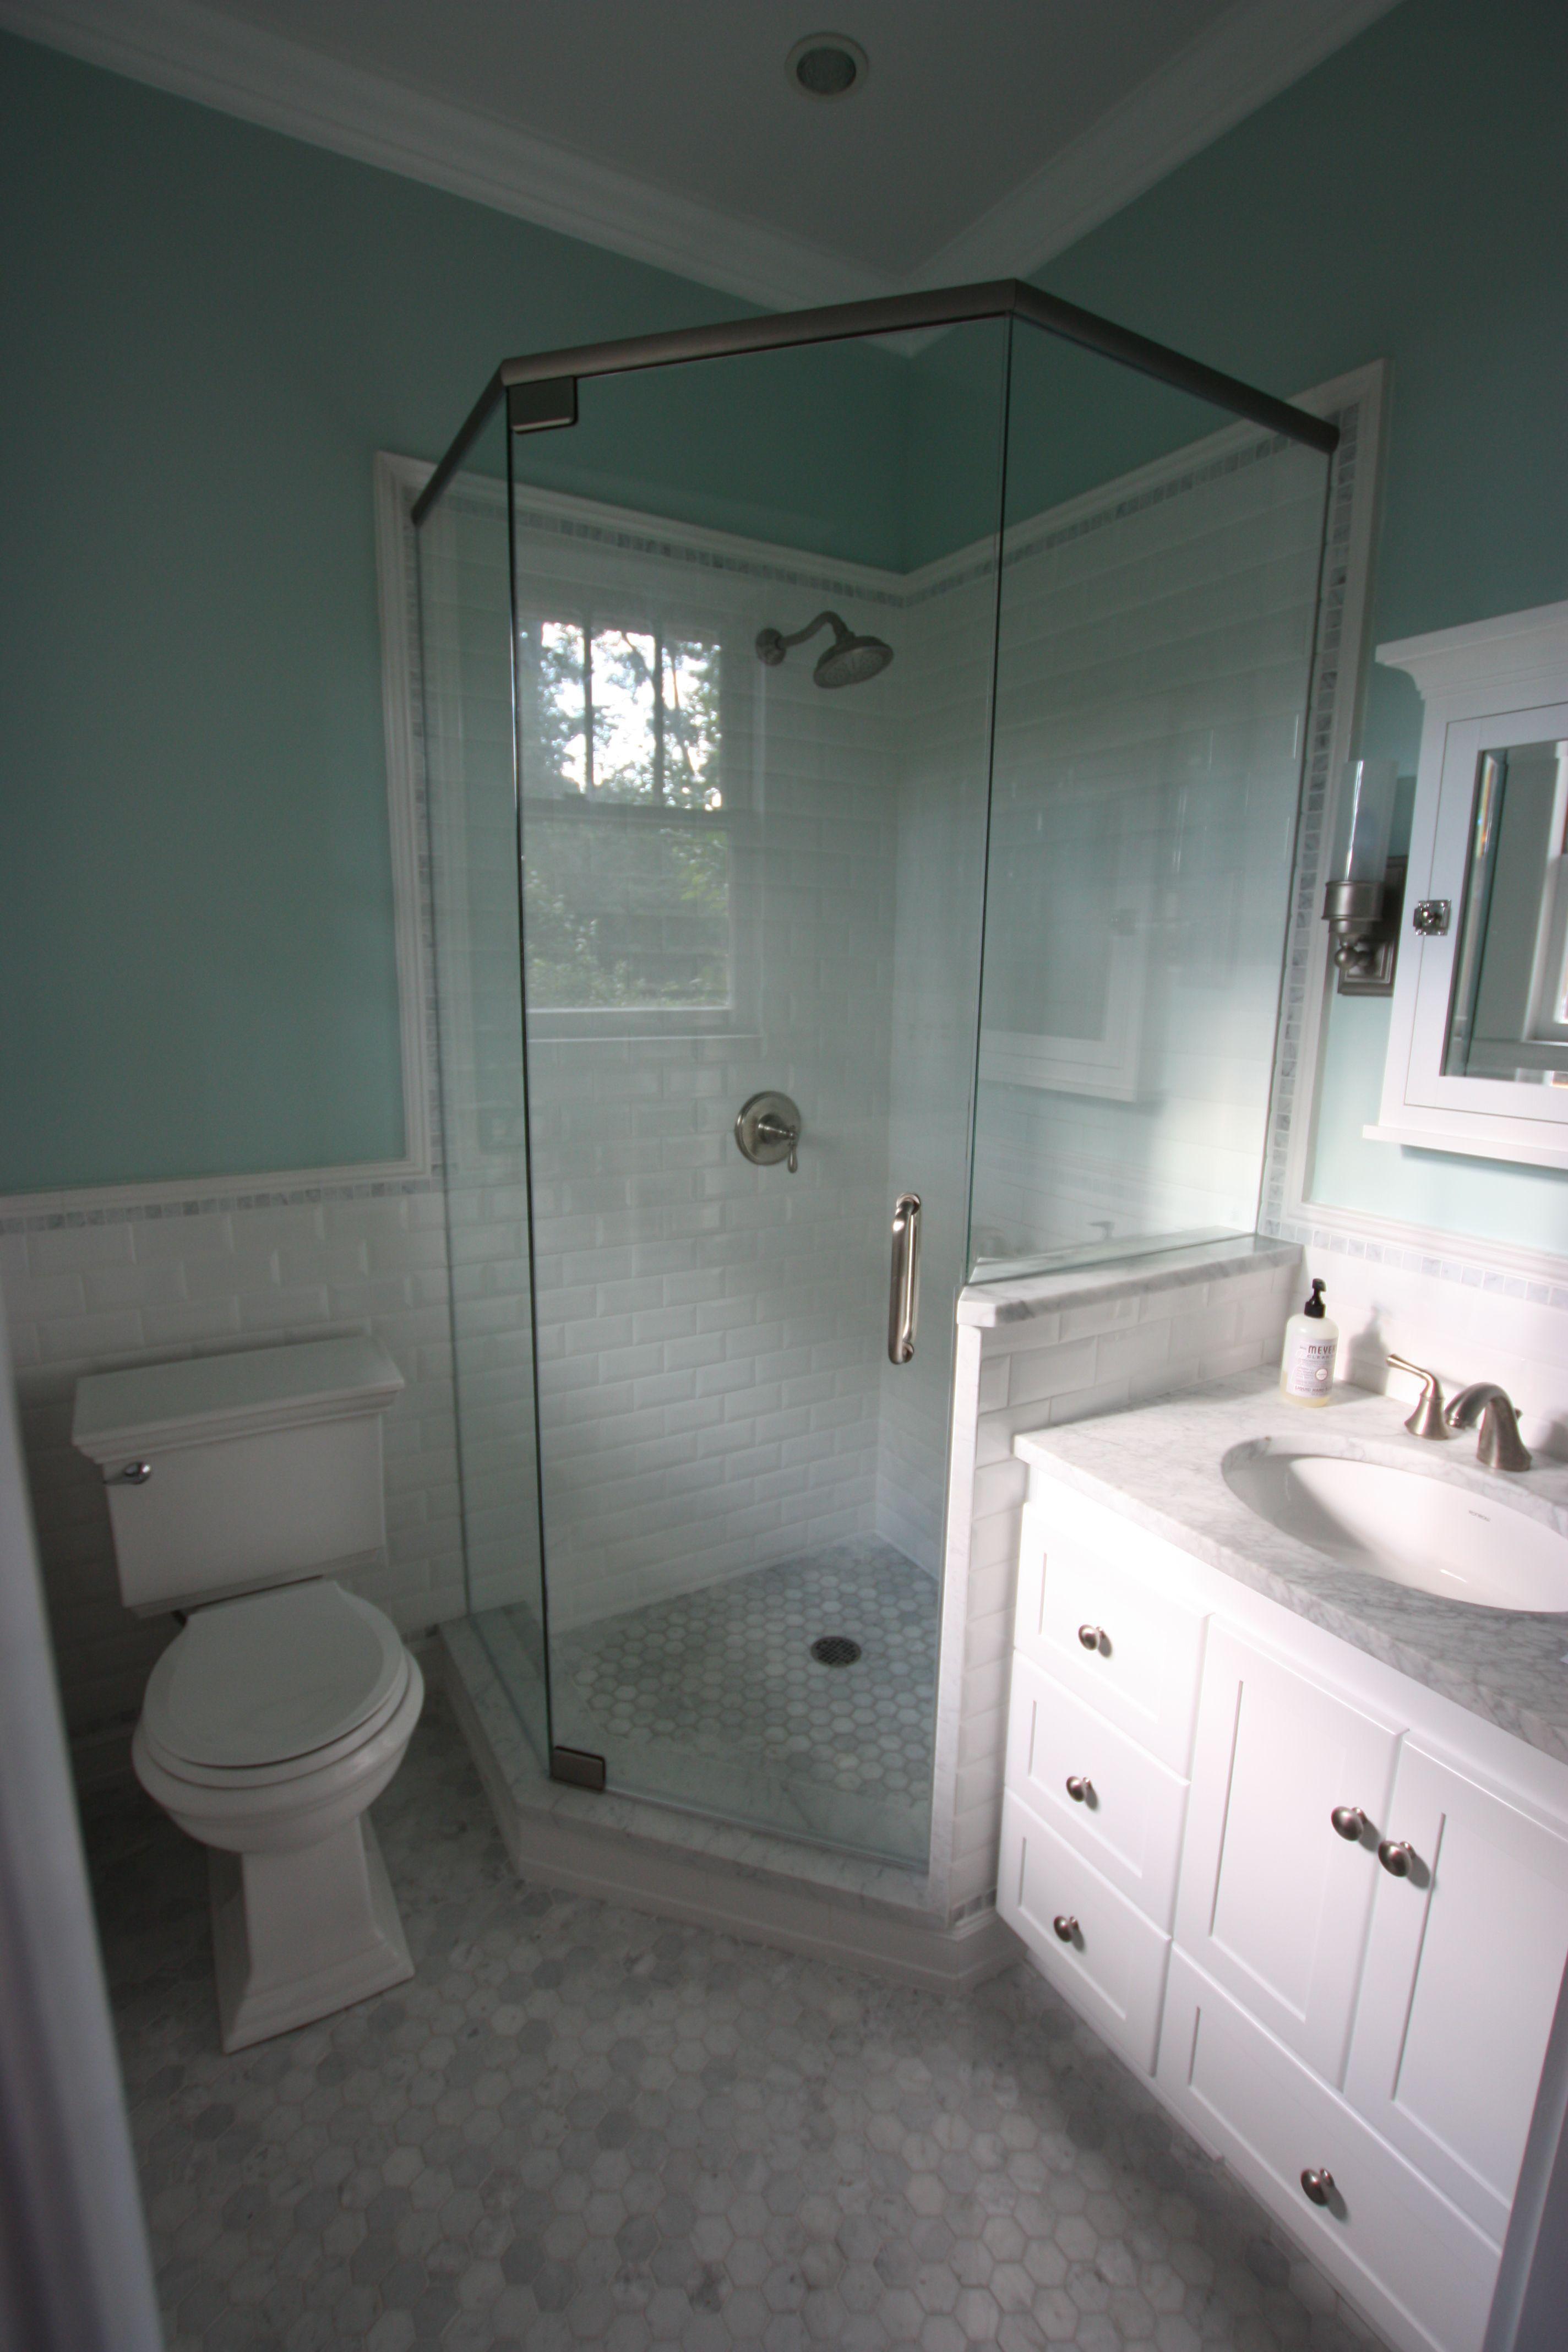 Bathroom Remodel Ideas With Jacuzzi Tub Awesome Basement Bathroom Ideas Bud Low Ceiling And For In 2020 Badezimmer Renovieren Kleine Badezimmer Kleines Bad Renovieren